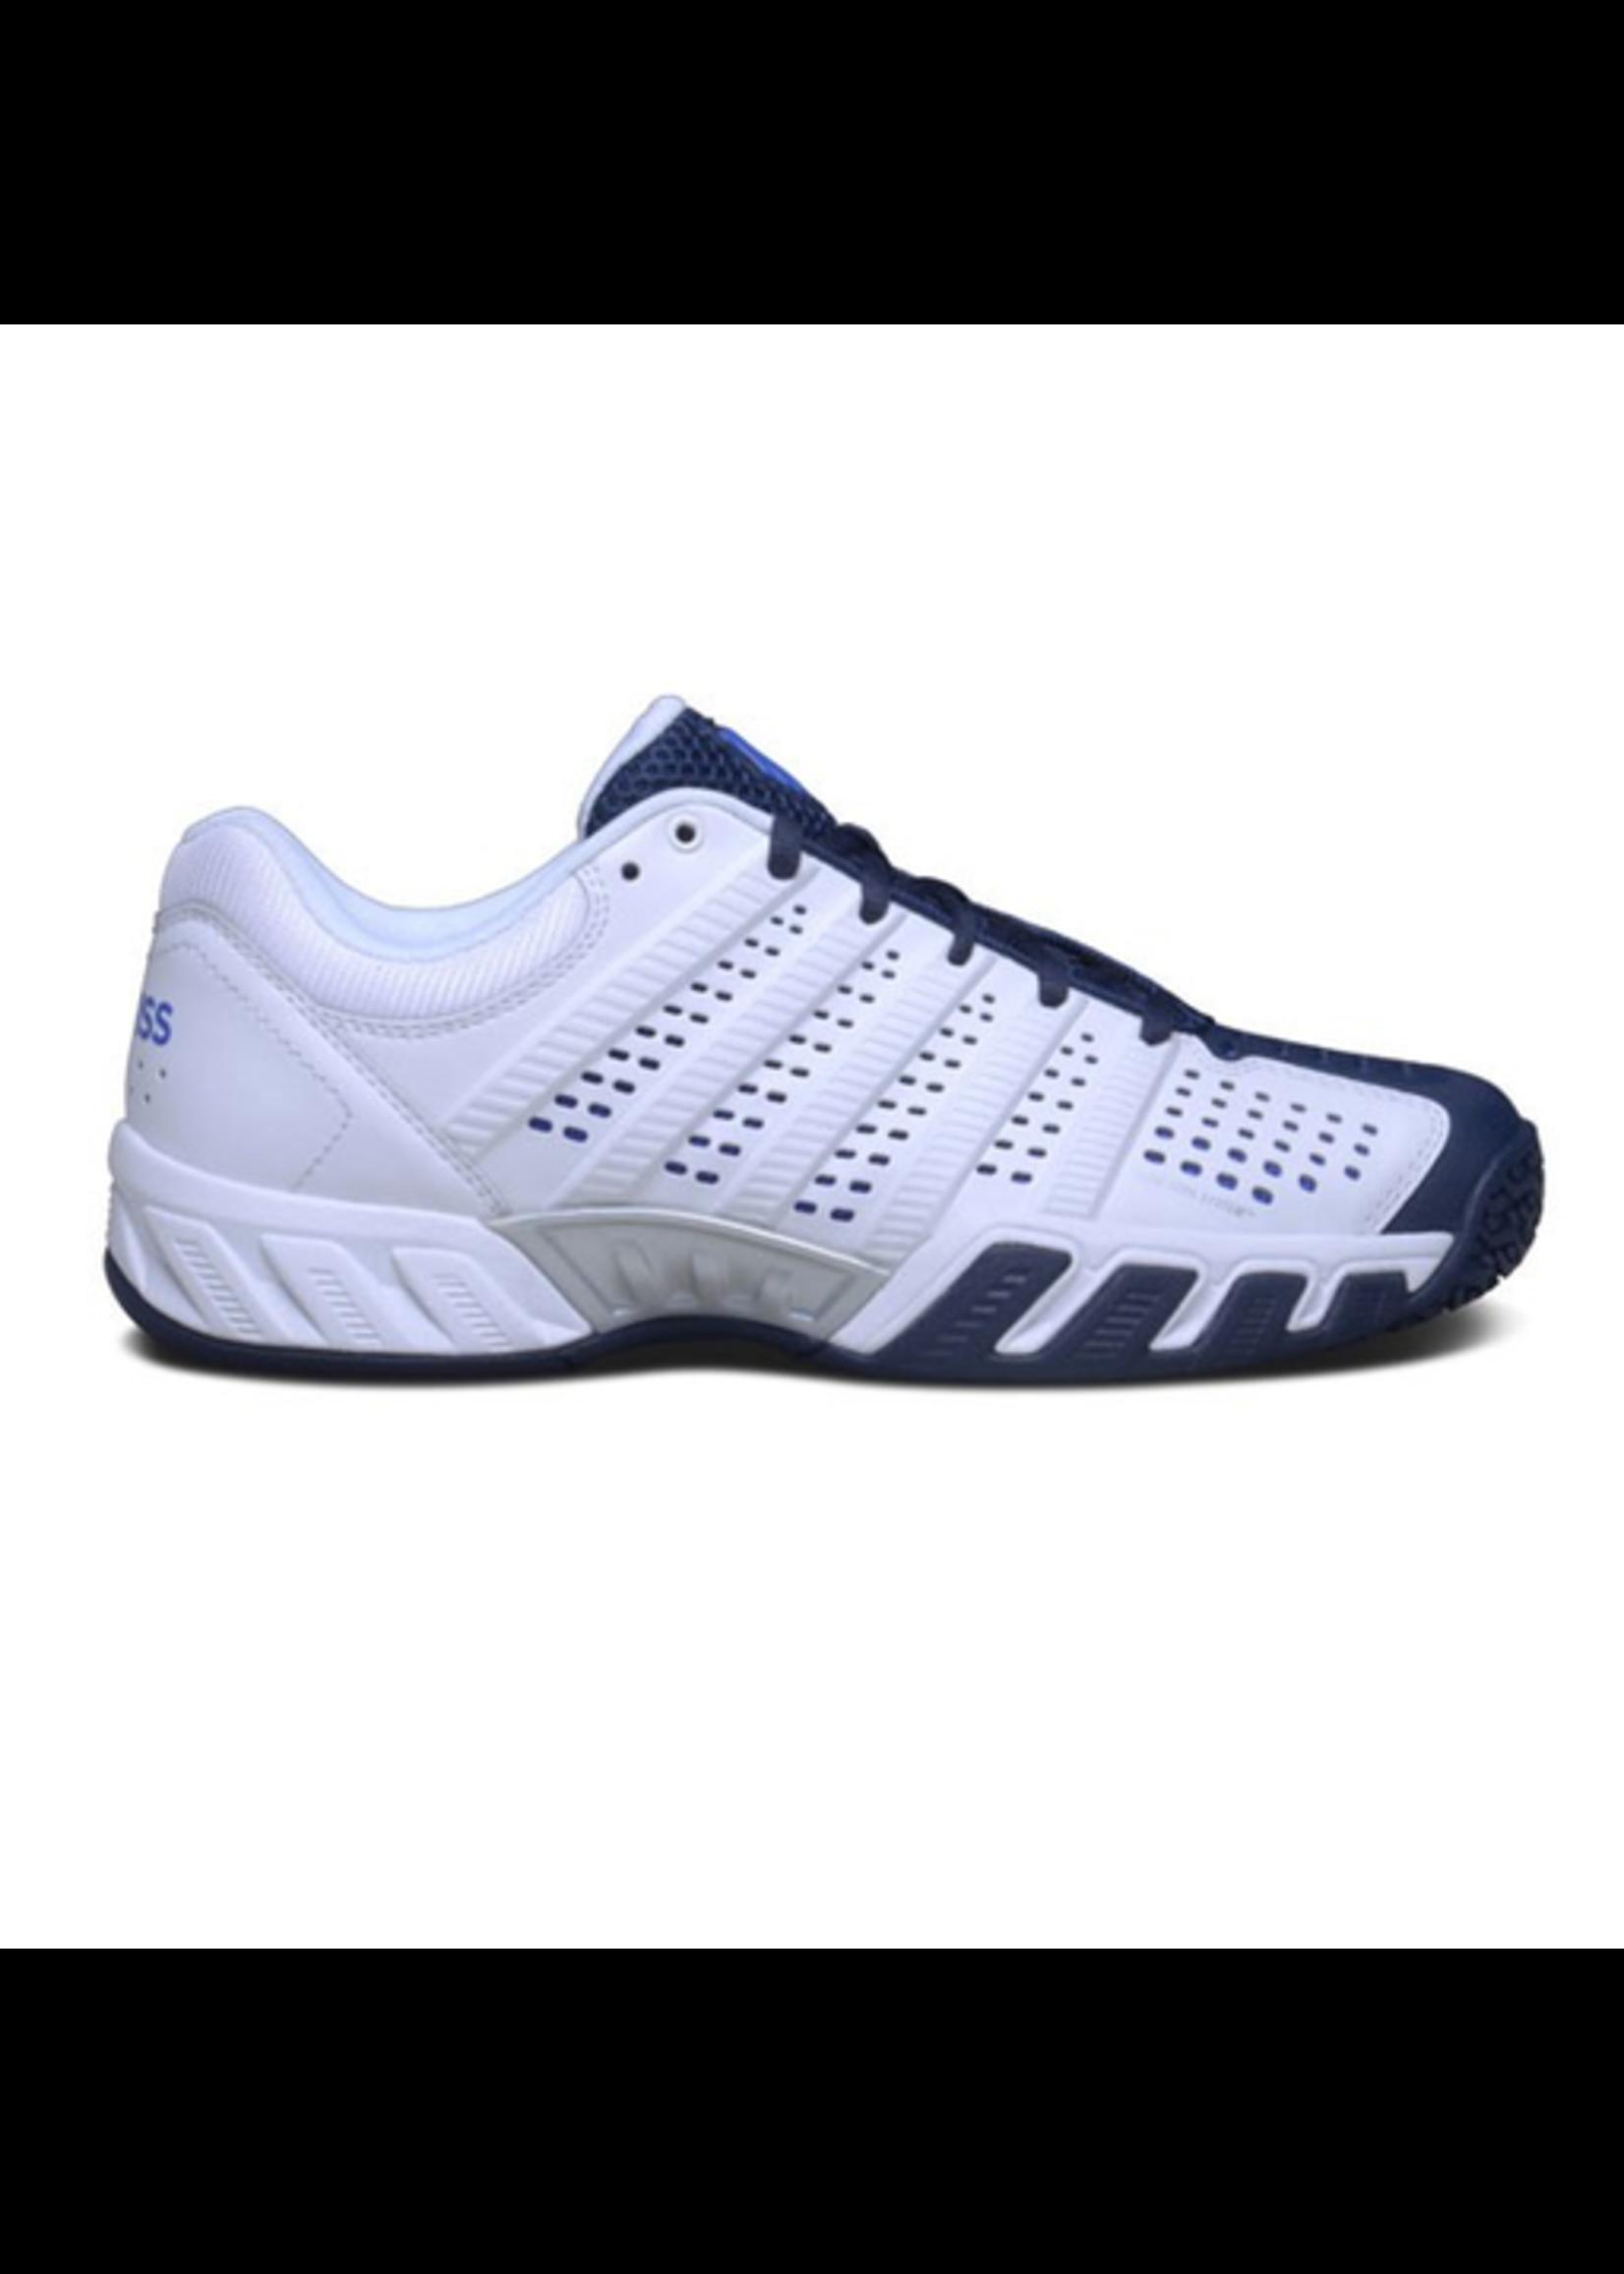 K Swiss Kswiss Big Shot Light 2.5 Mens tennis shoes White/Navy 7.5